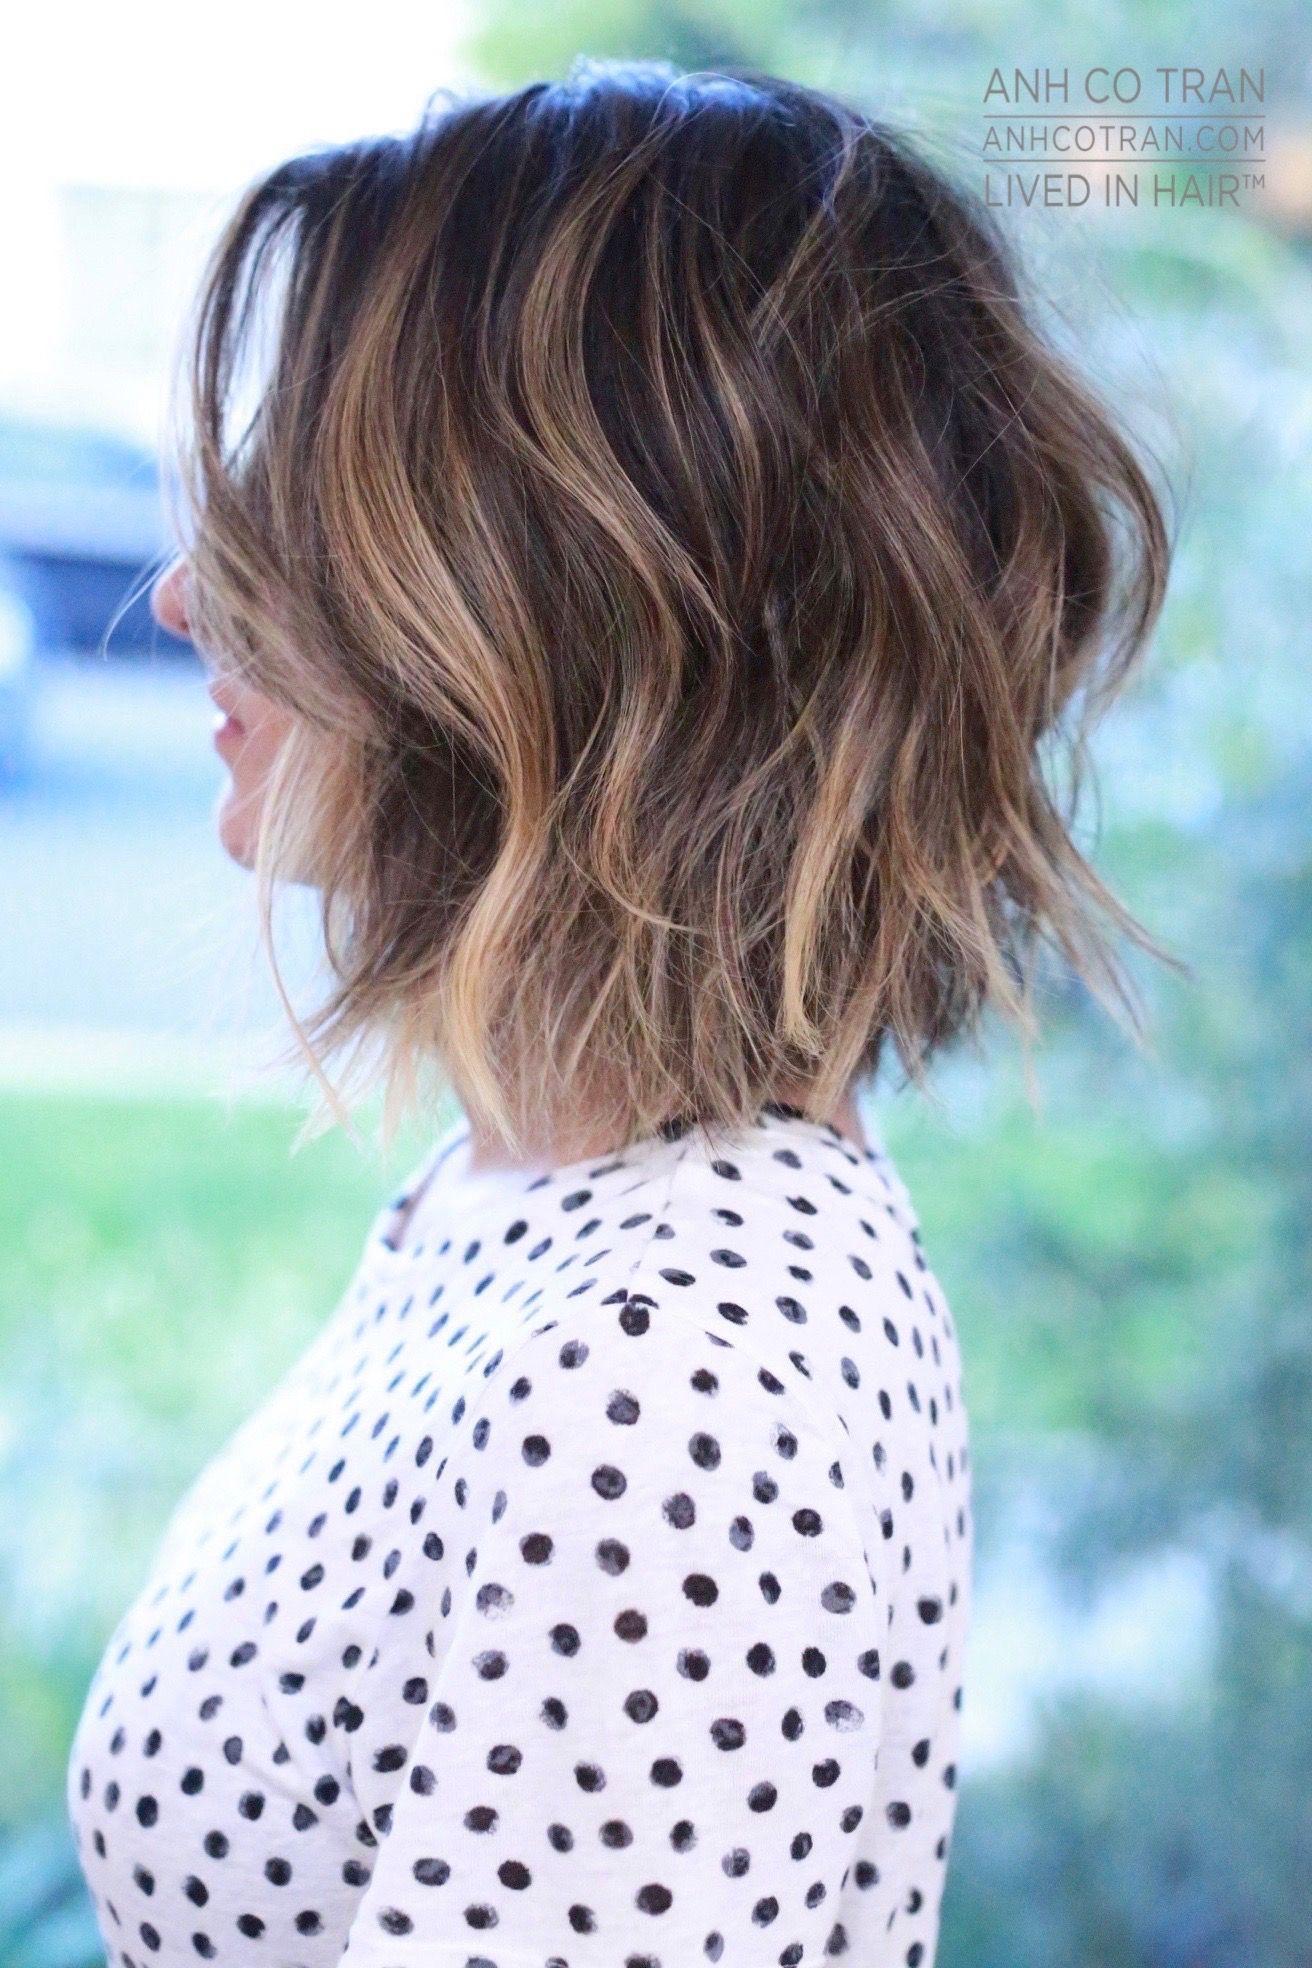 Anh co tran haircuts pinterest hair cuts hair style and short